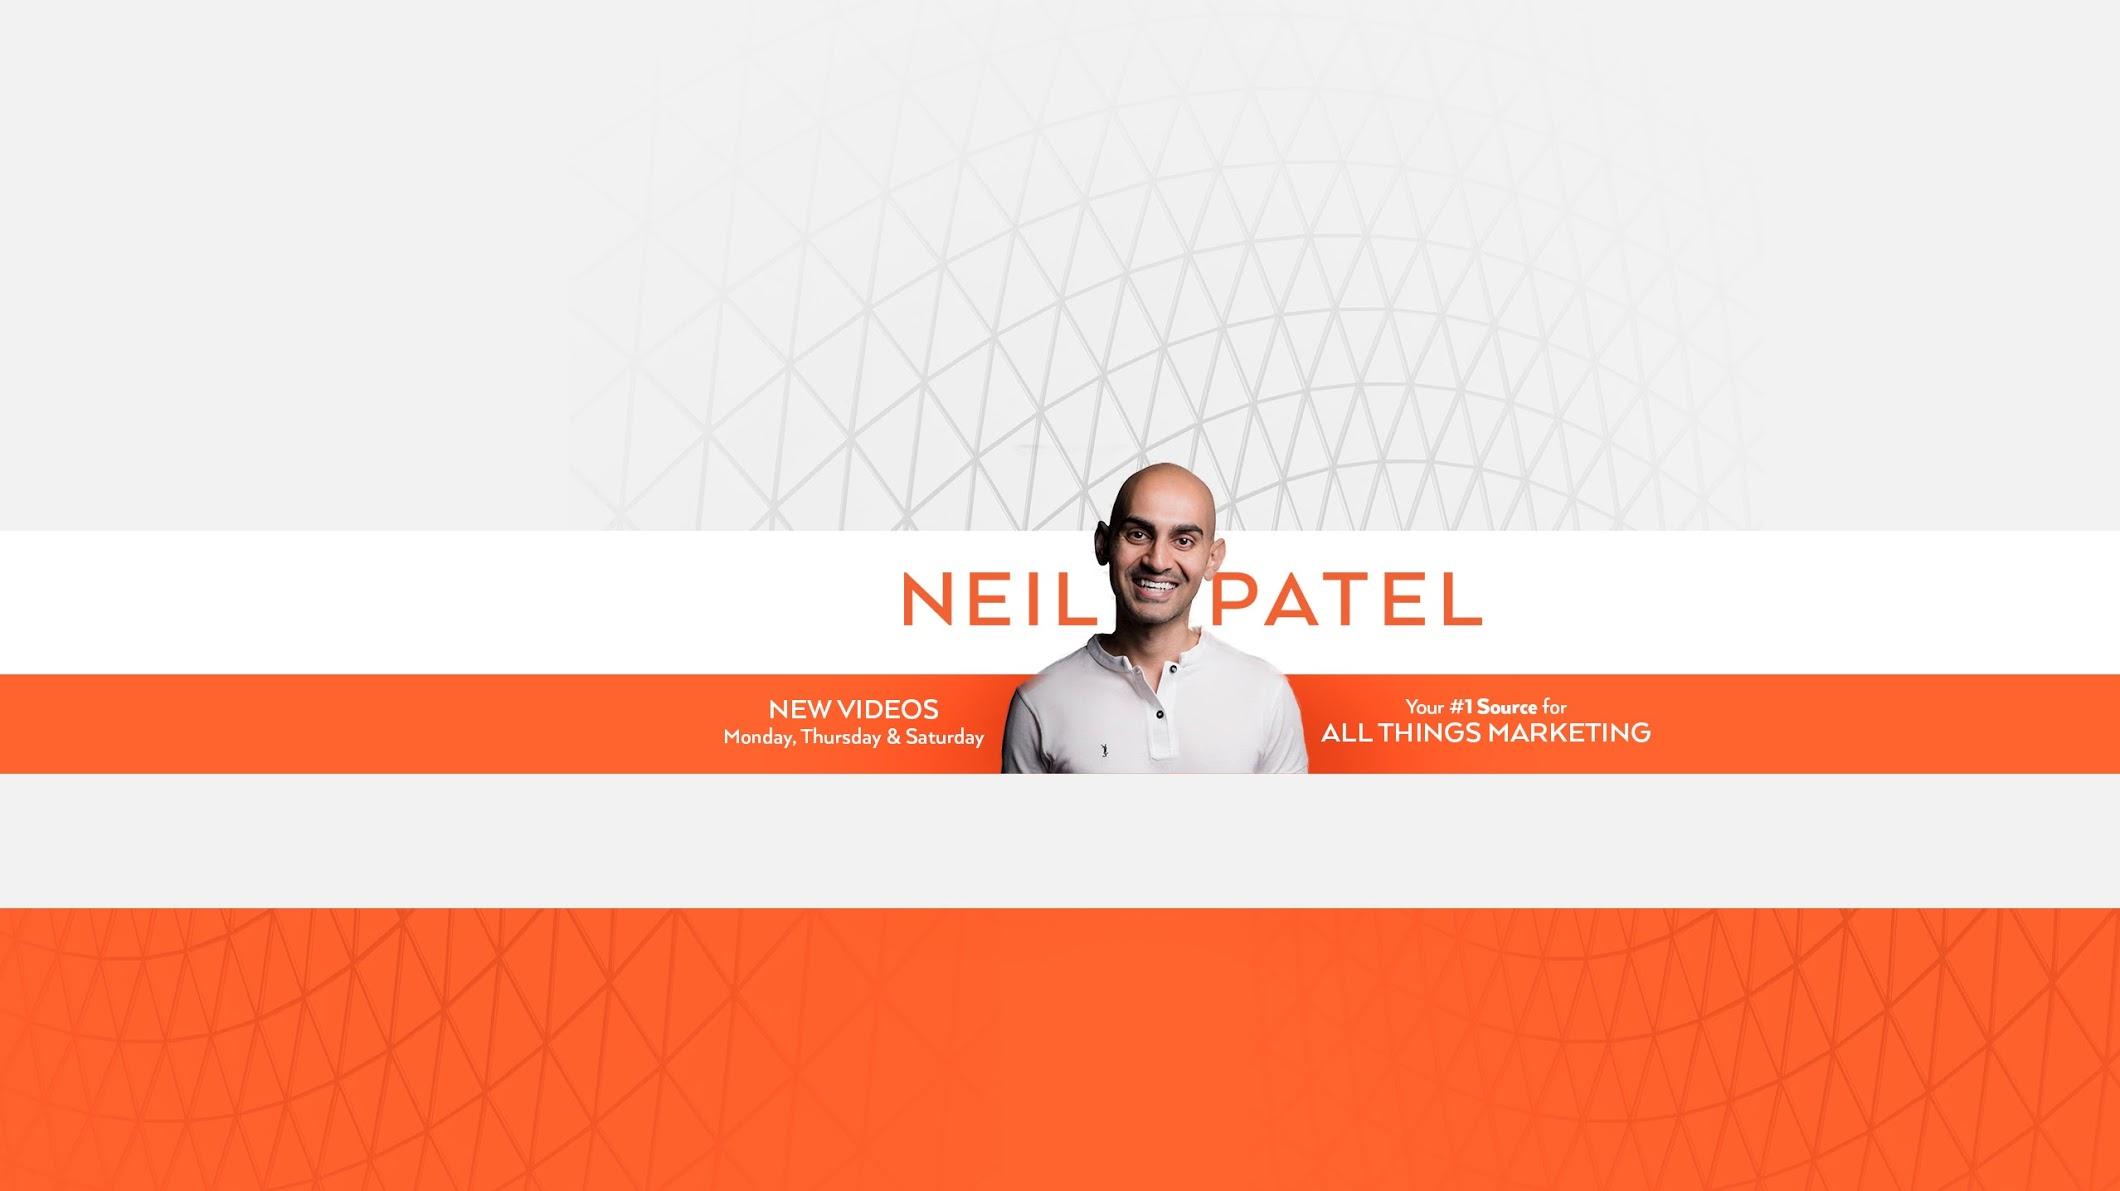 Neil Patel- eCommerce Youtube Channels 2021